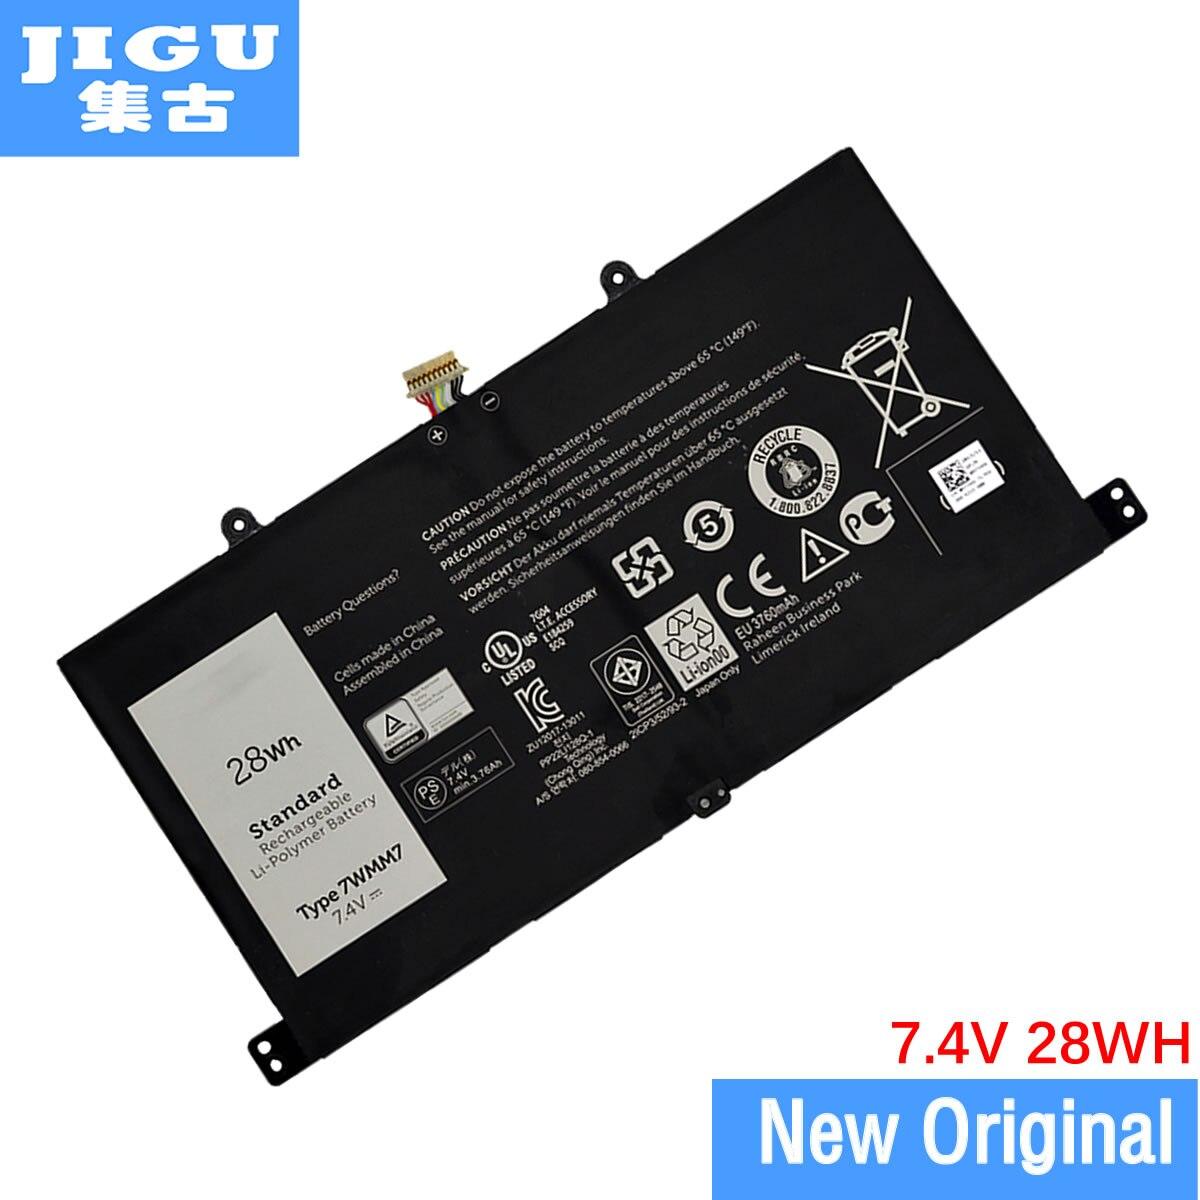 Jigu Nieuwe 7.4V 28Wh Voor Dell Venue 11 Pro Toetsenbord Tablet Batterij 7WMM7 CFC6C CP305193L1 D1R74